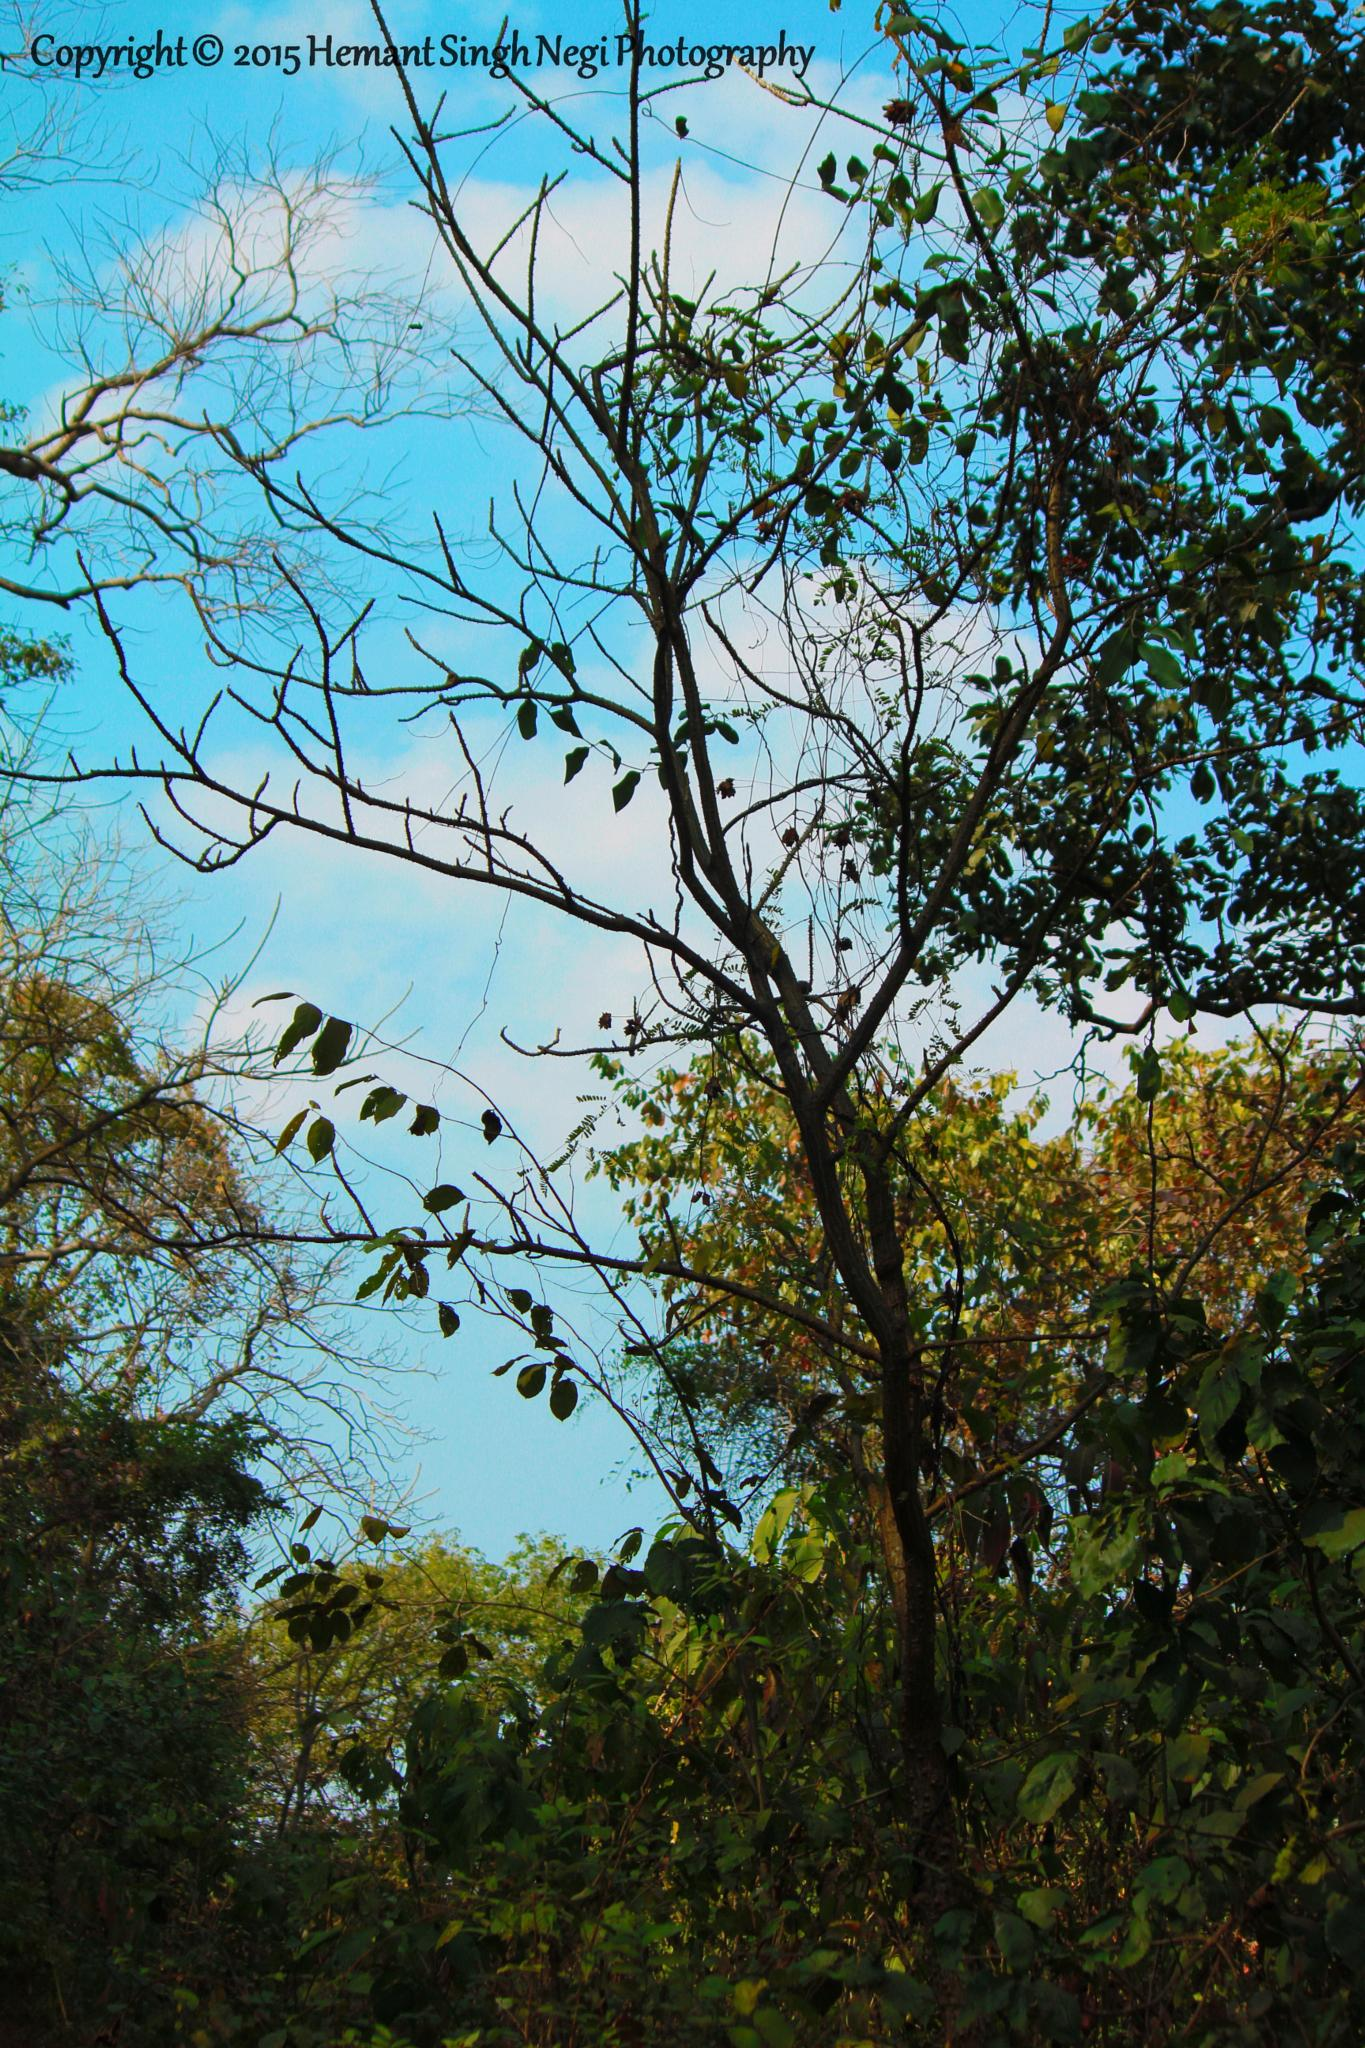 The Blues by HEMANT SINGH NEGI